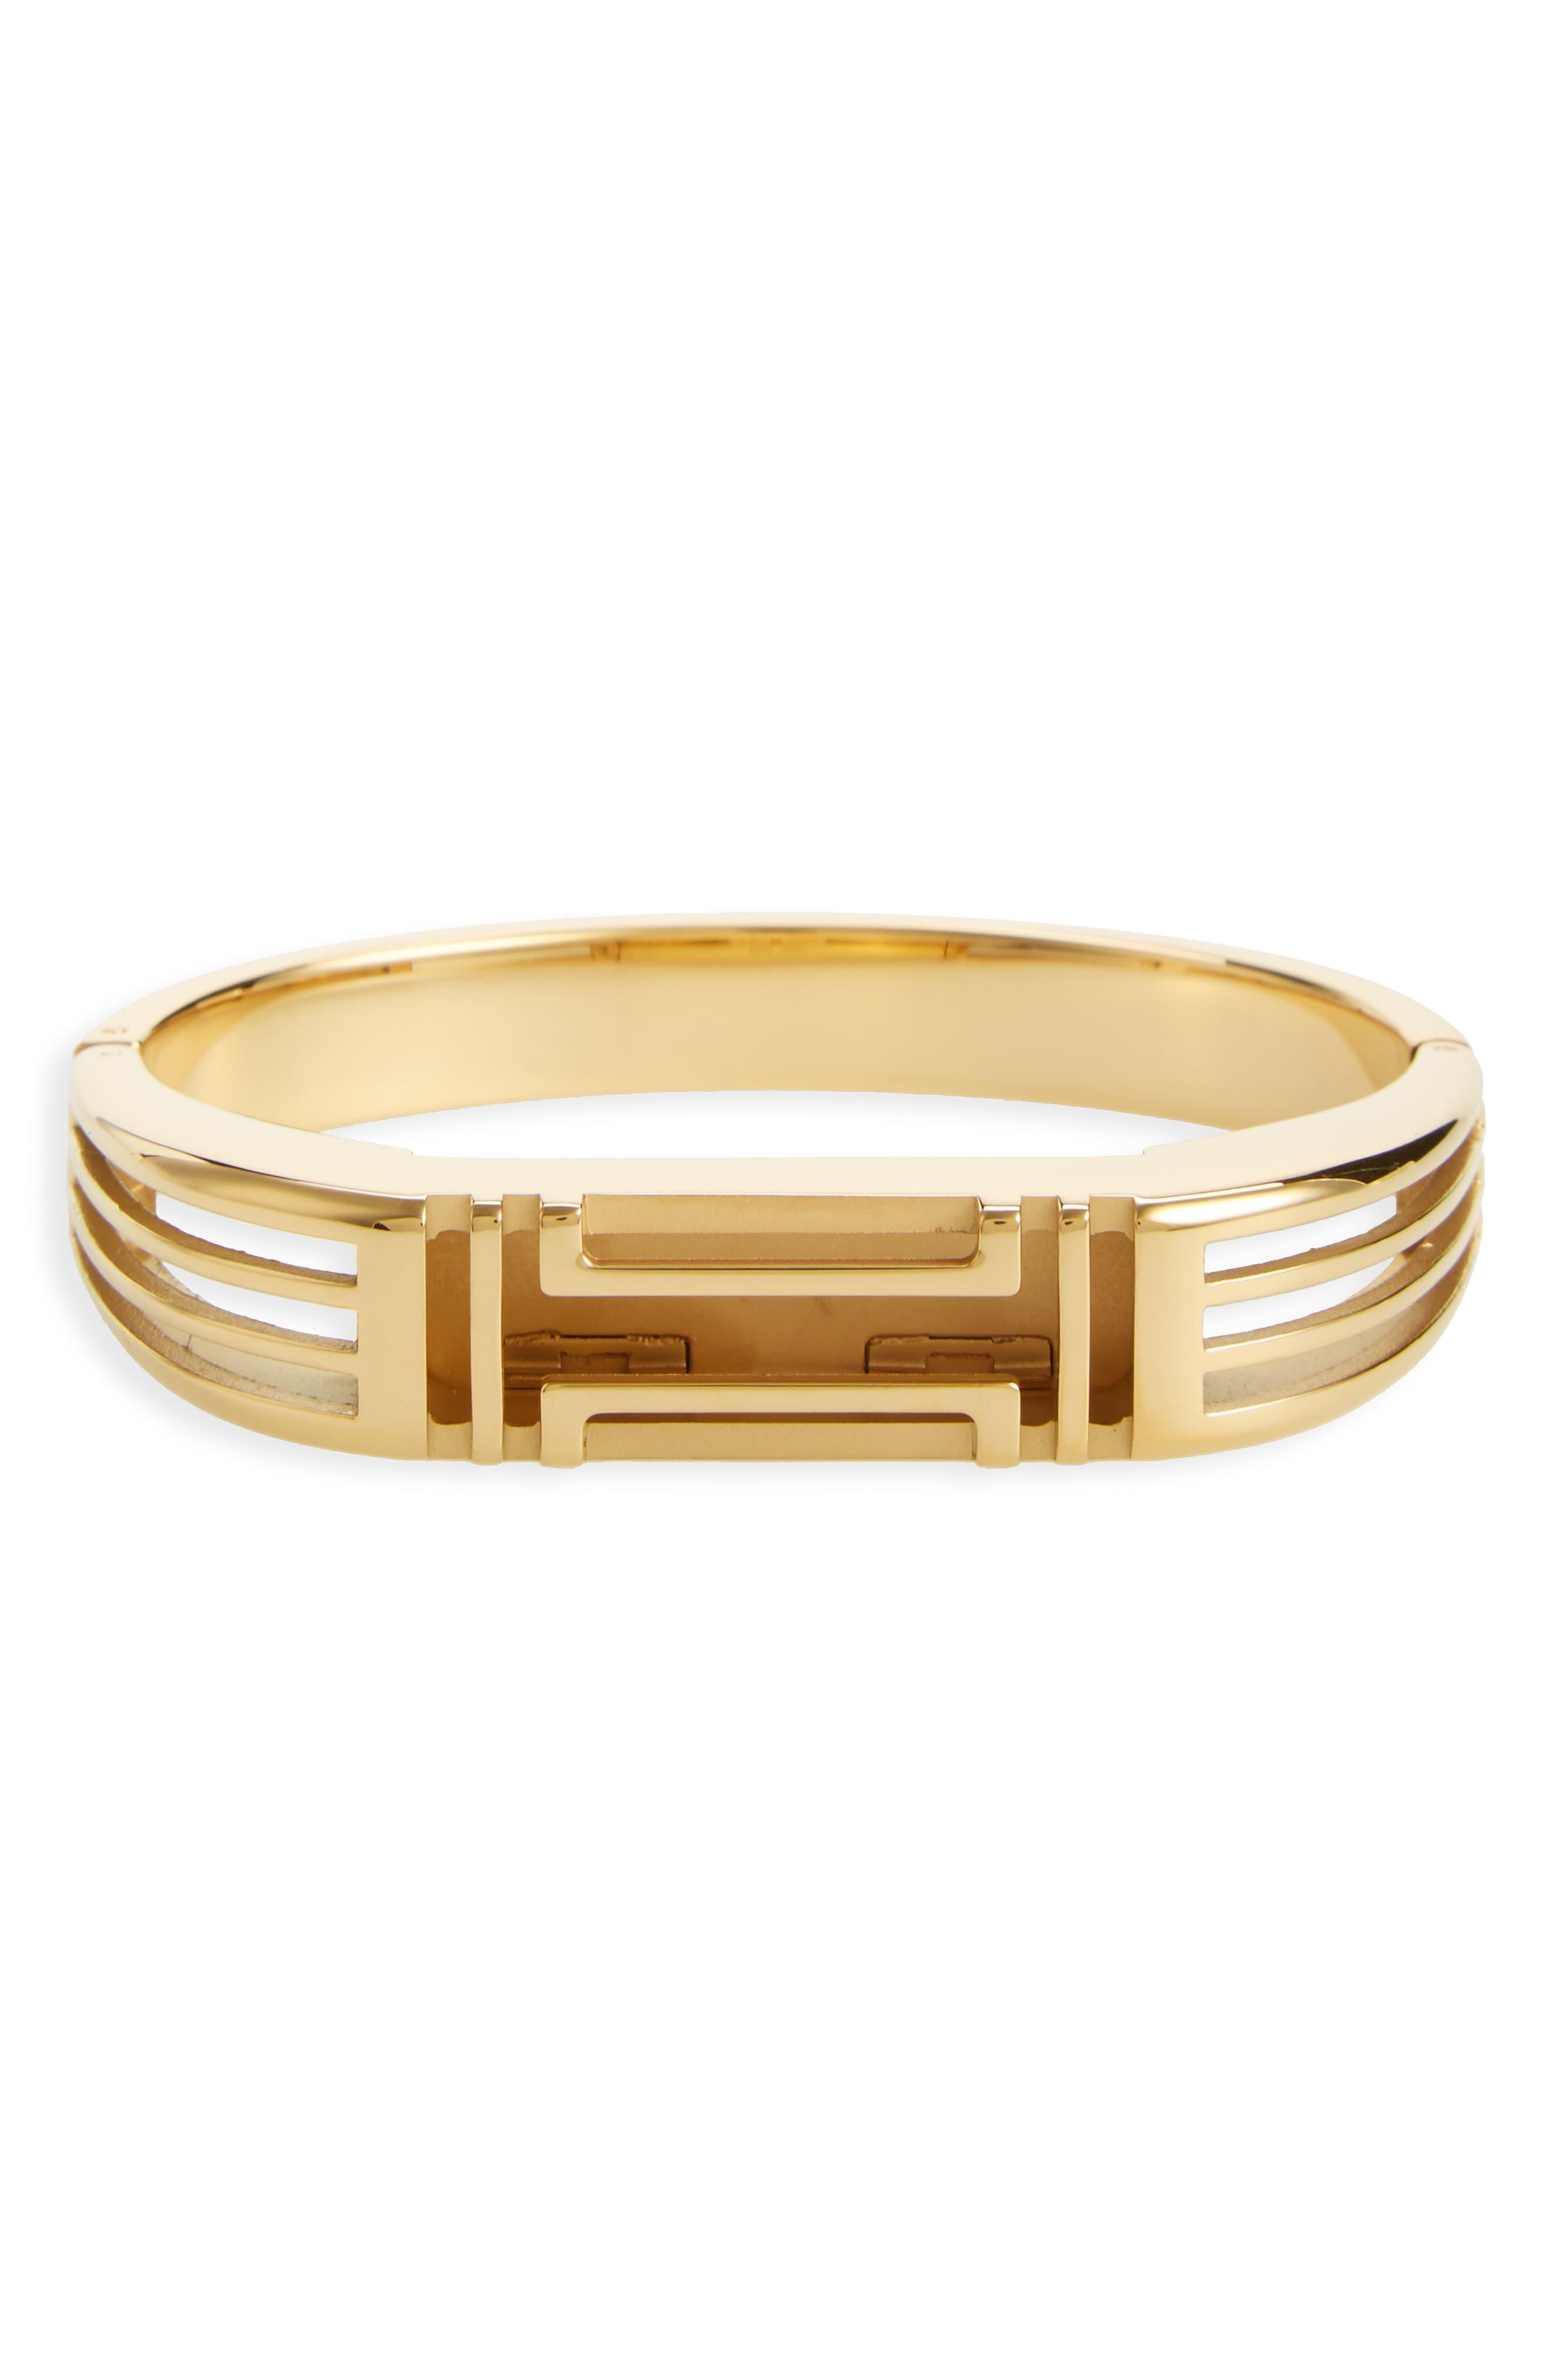 Main Image - Tory Burch for Fitbit® Hinge Bracelet